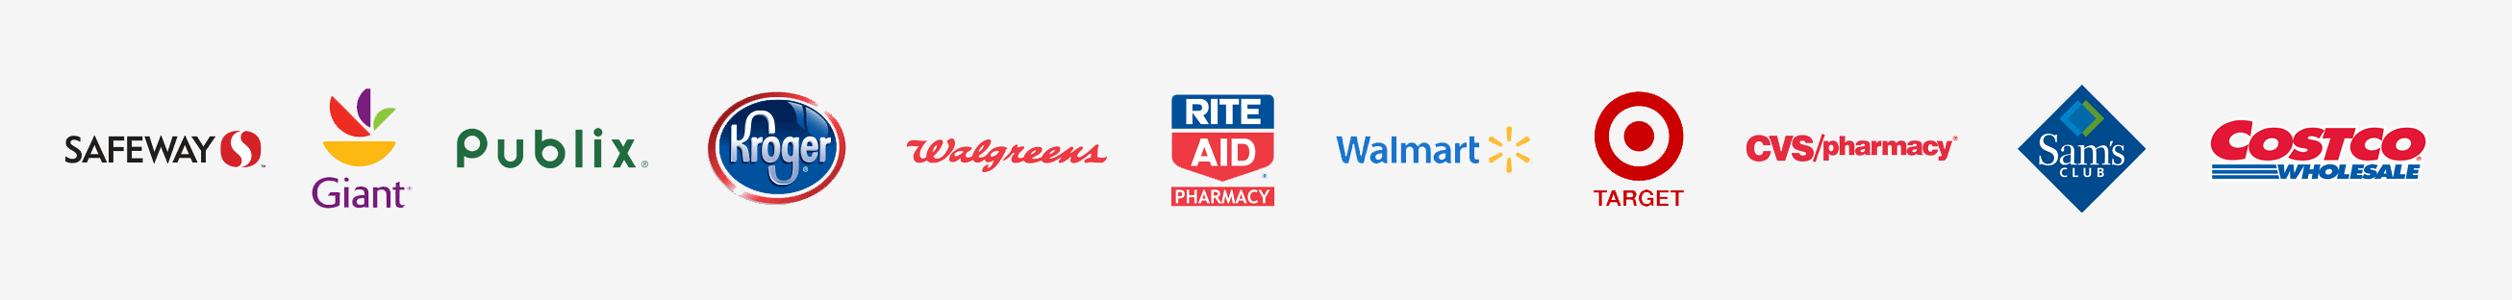 Available at most U.S. pharmacies including CVS, Walgreens, Rite Aid, Walmart, Target, Kroger, Kmart, Publix, Safeway, Sam's Club, and many more.